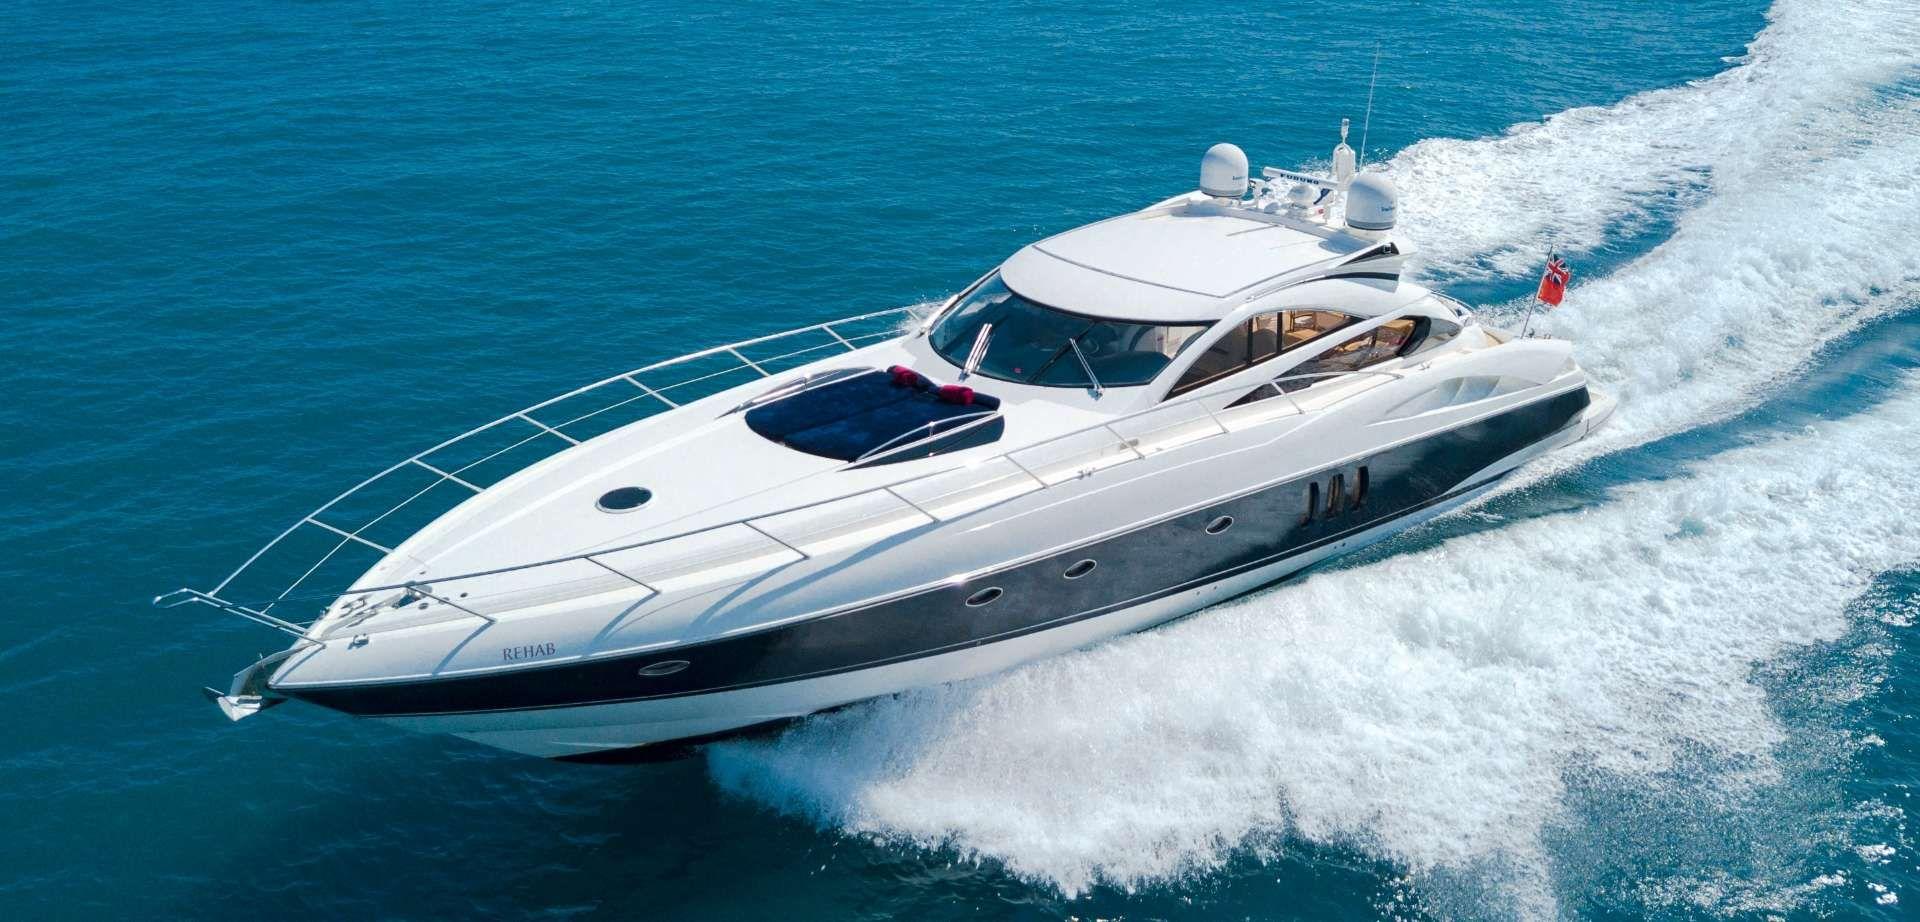 REHAB - Sunseeker Predator 68 - 2 Cabins - Antibes - Cannes - St Tropez - Monaco